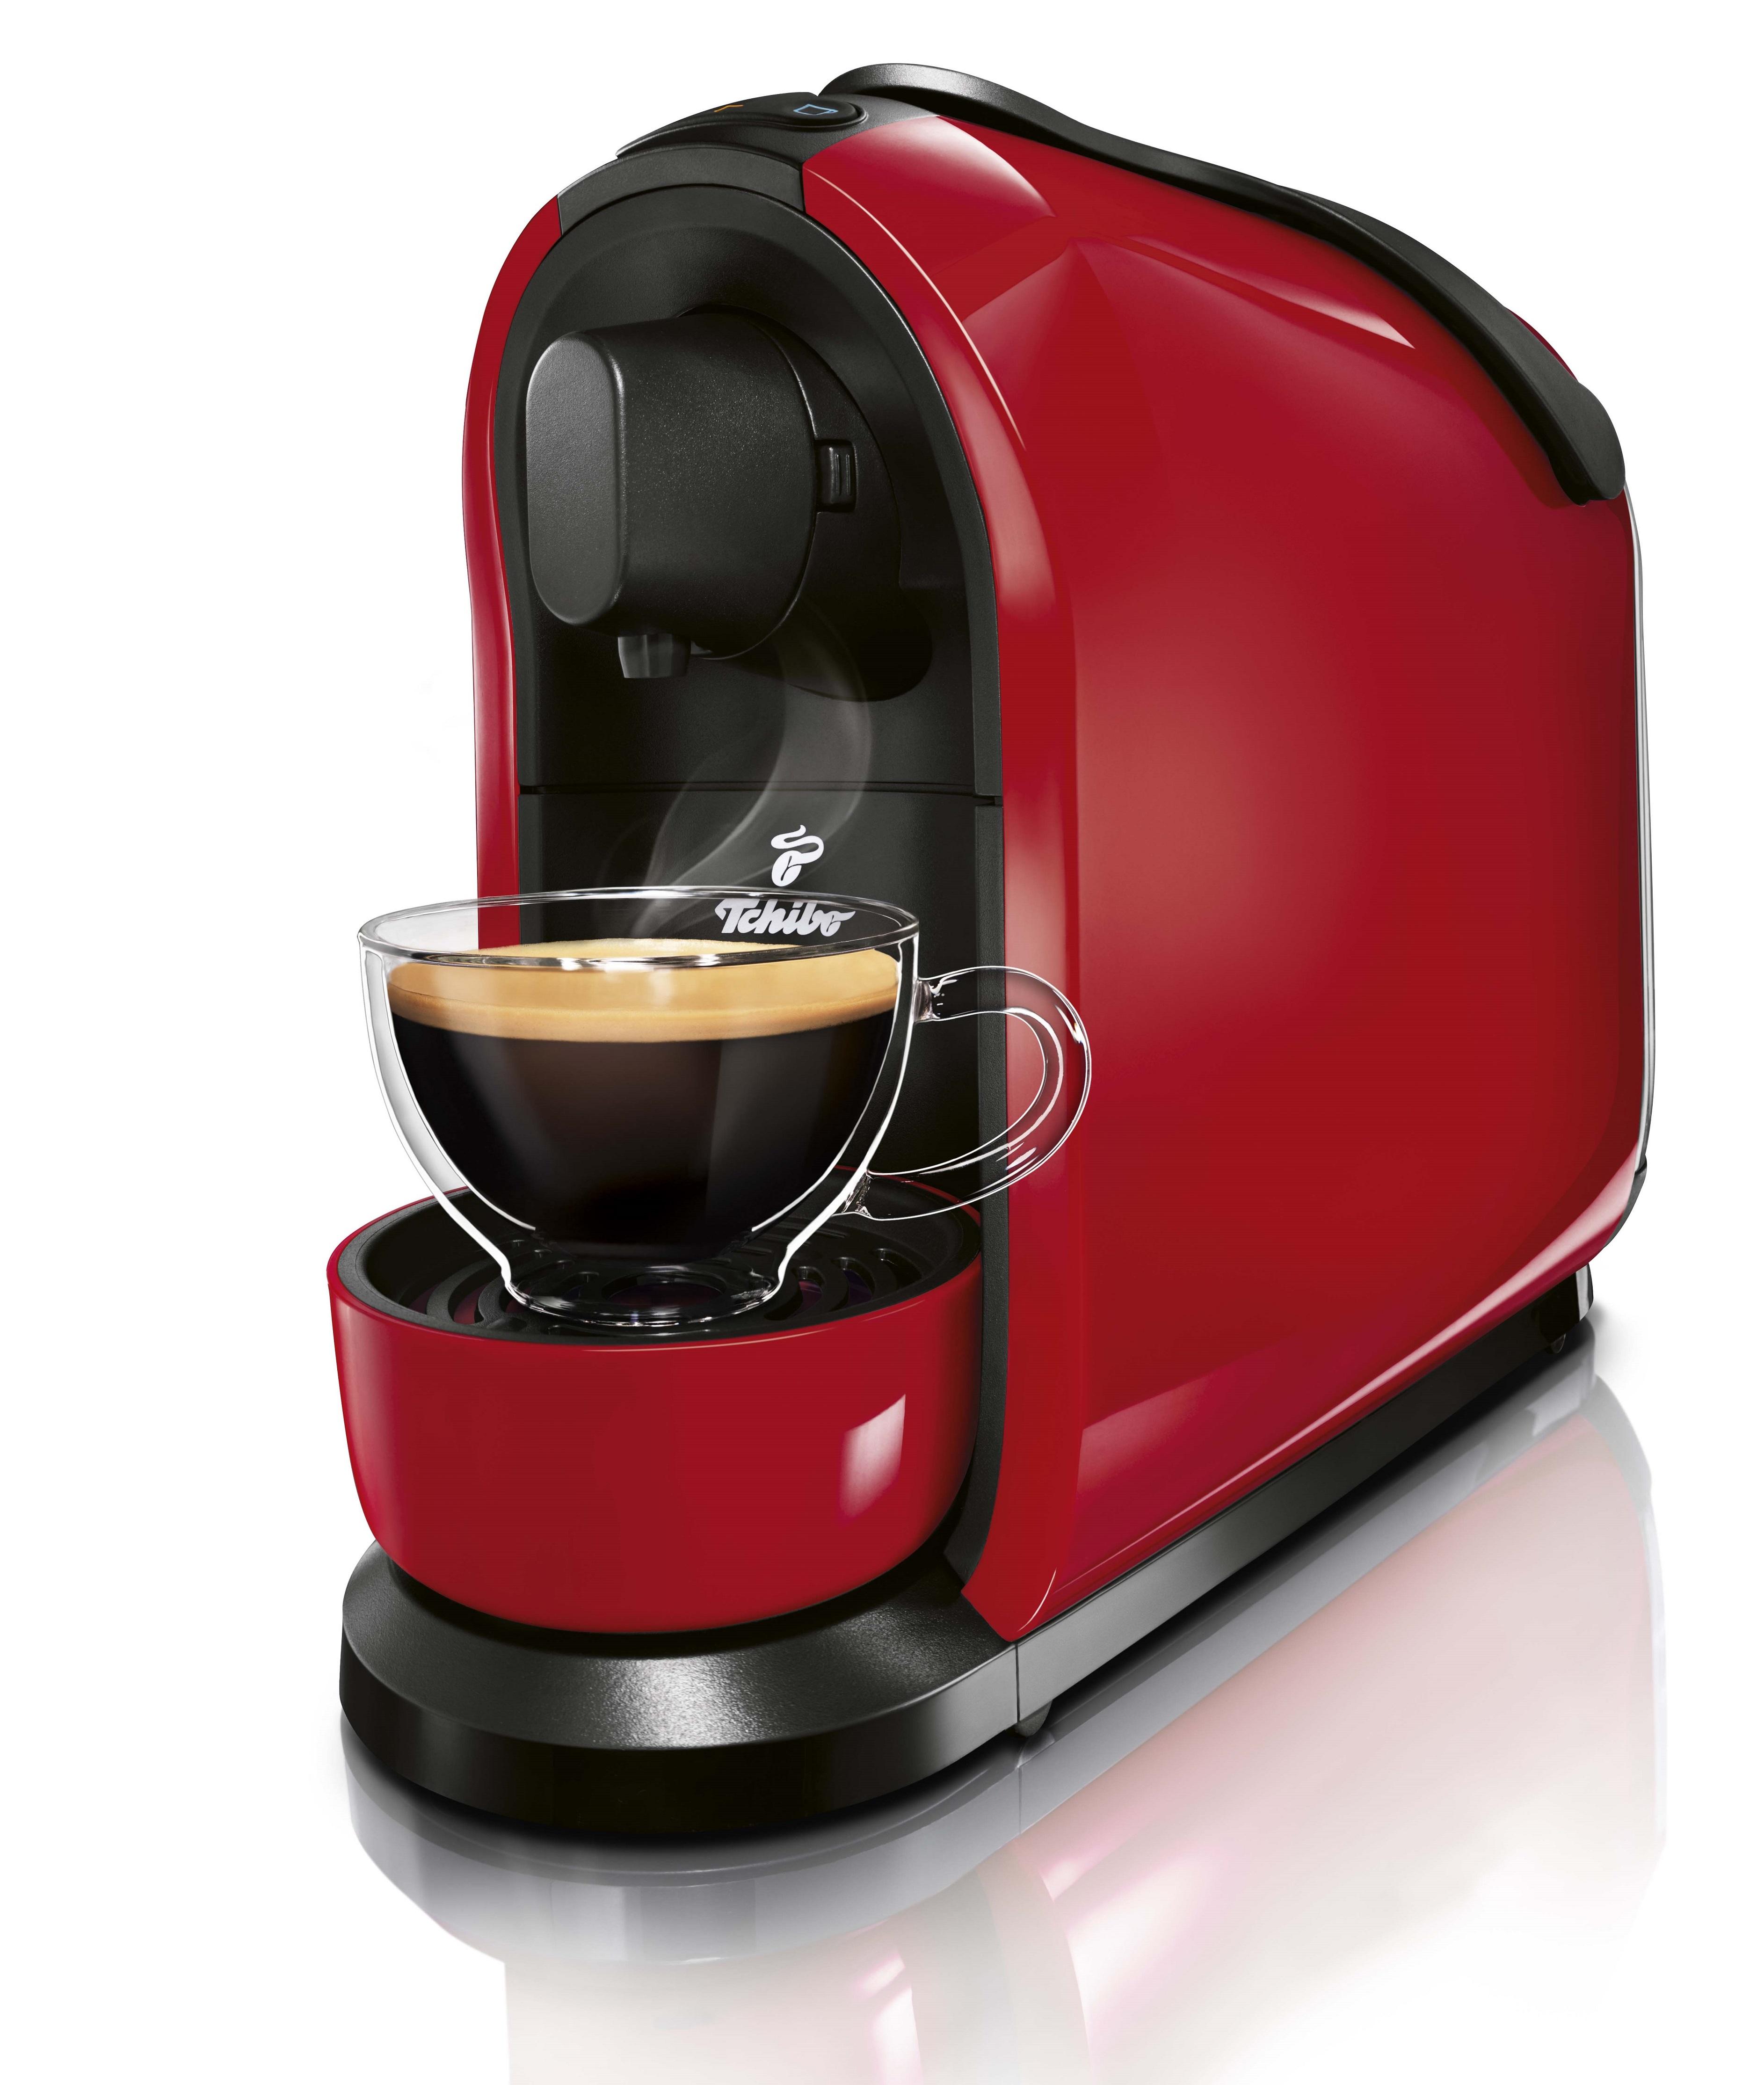 Descriere Aparat de cafea, 3 presiuni, 1L, rosu, TCHIBO Cafissimo PURE